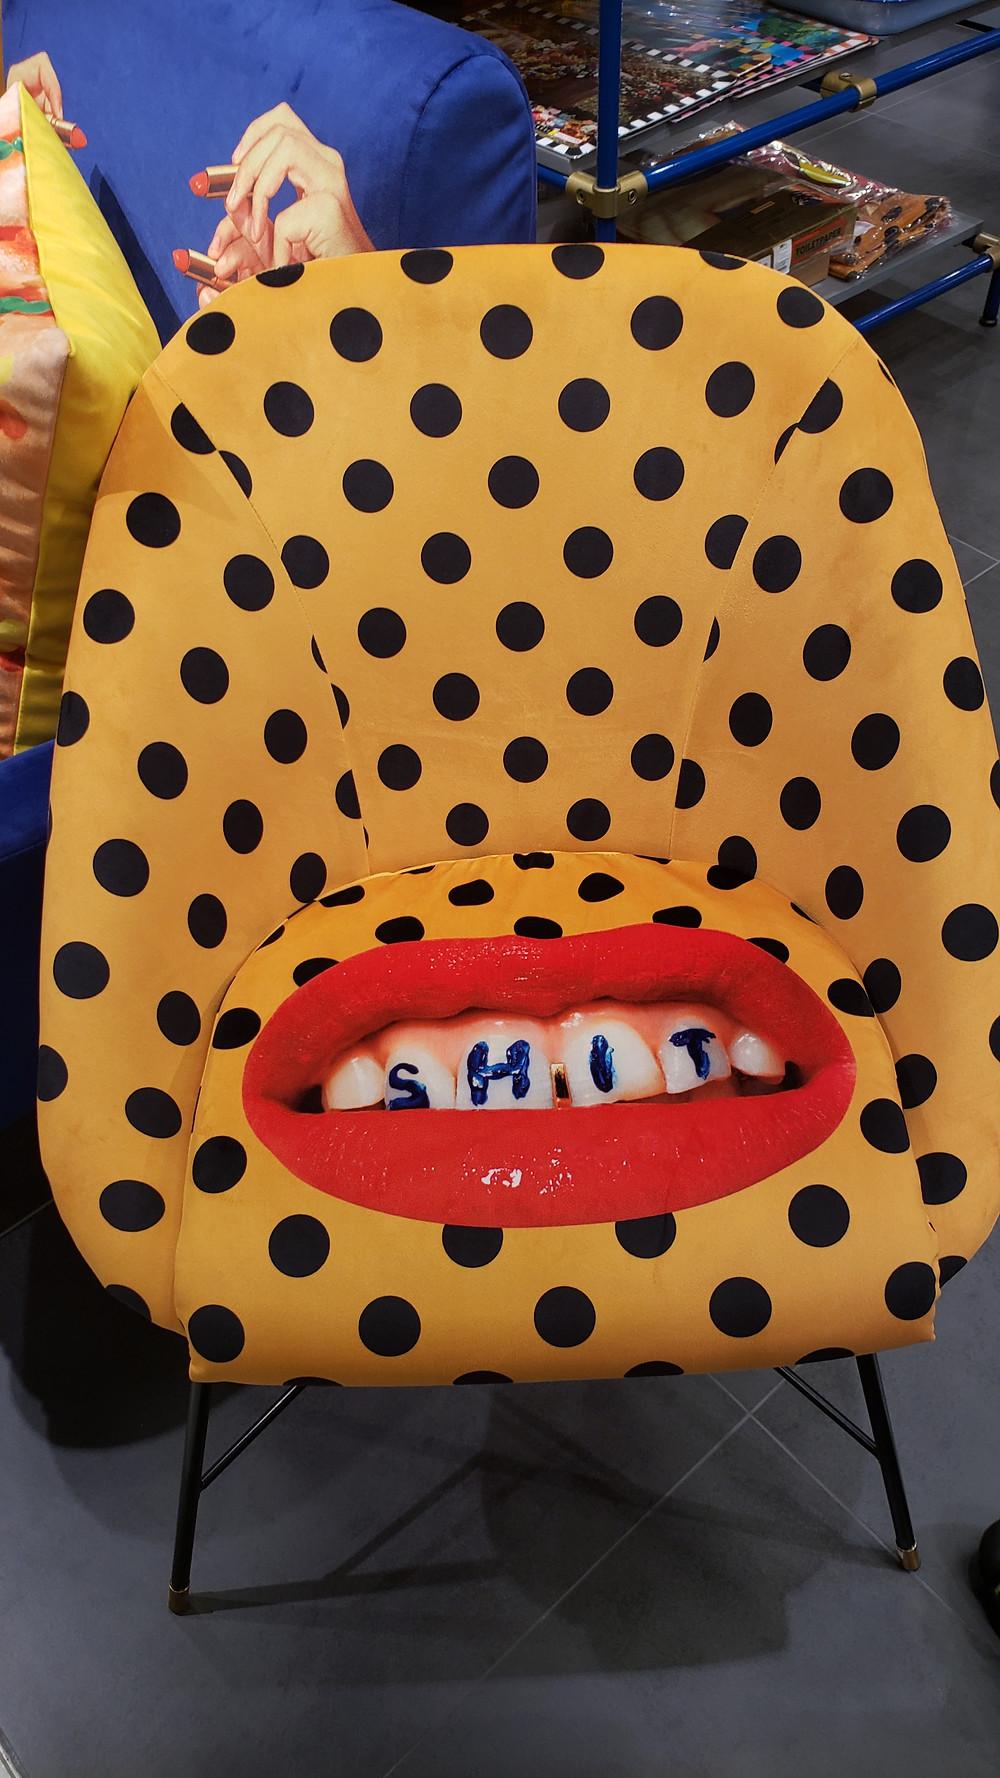 Shit chair. weird chair on Busan department store.